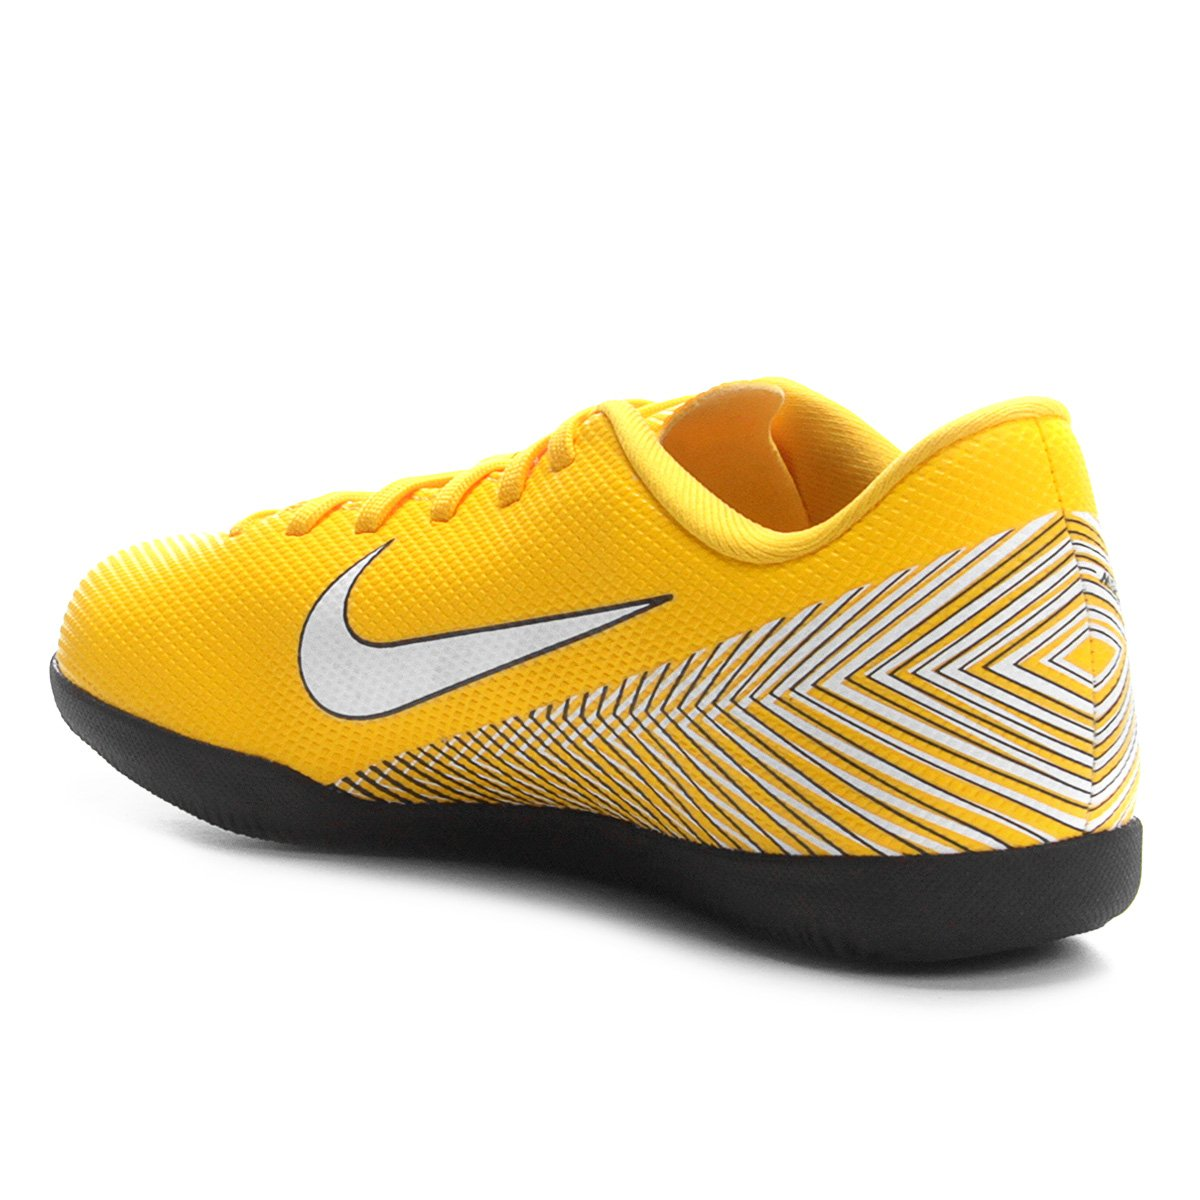 574c40f912920 Foto 2 - Chuteira Futsal Infantil Nike Mercurial Vapor 12 Club GS Neymar IC